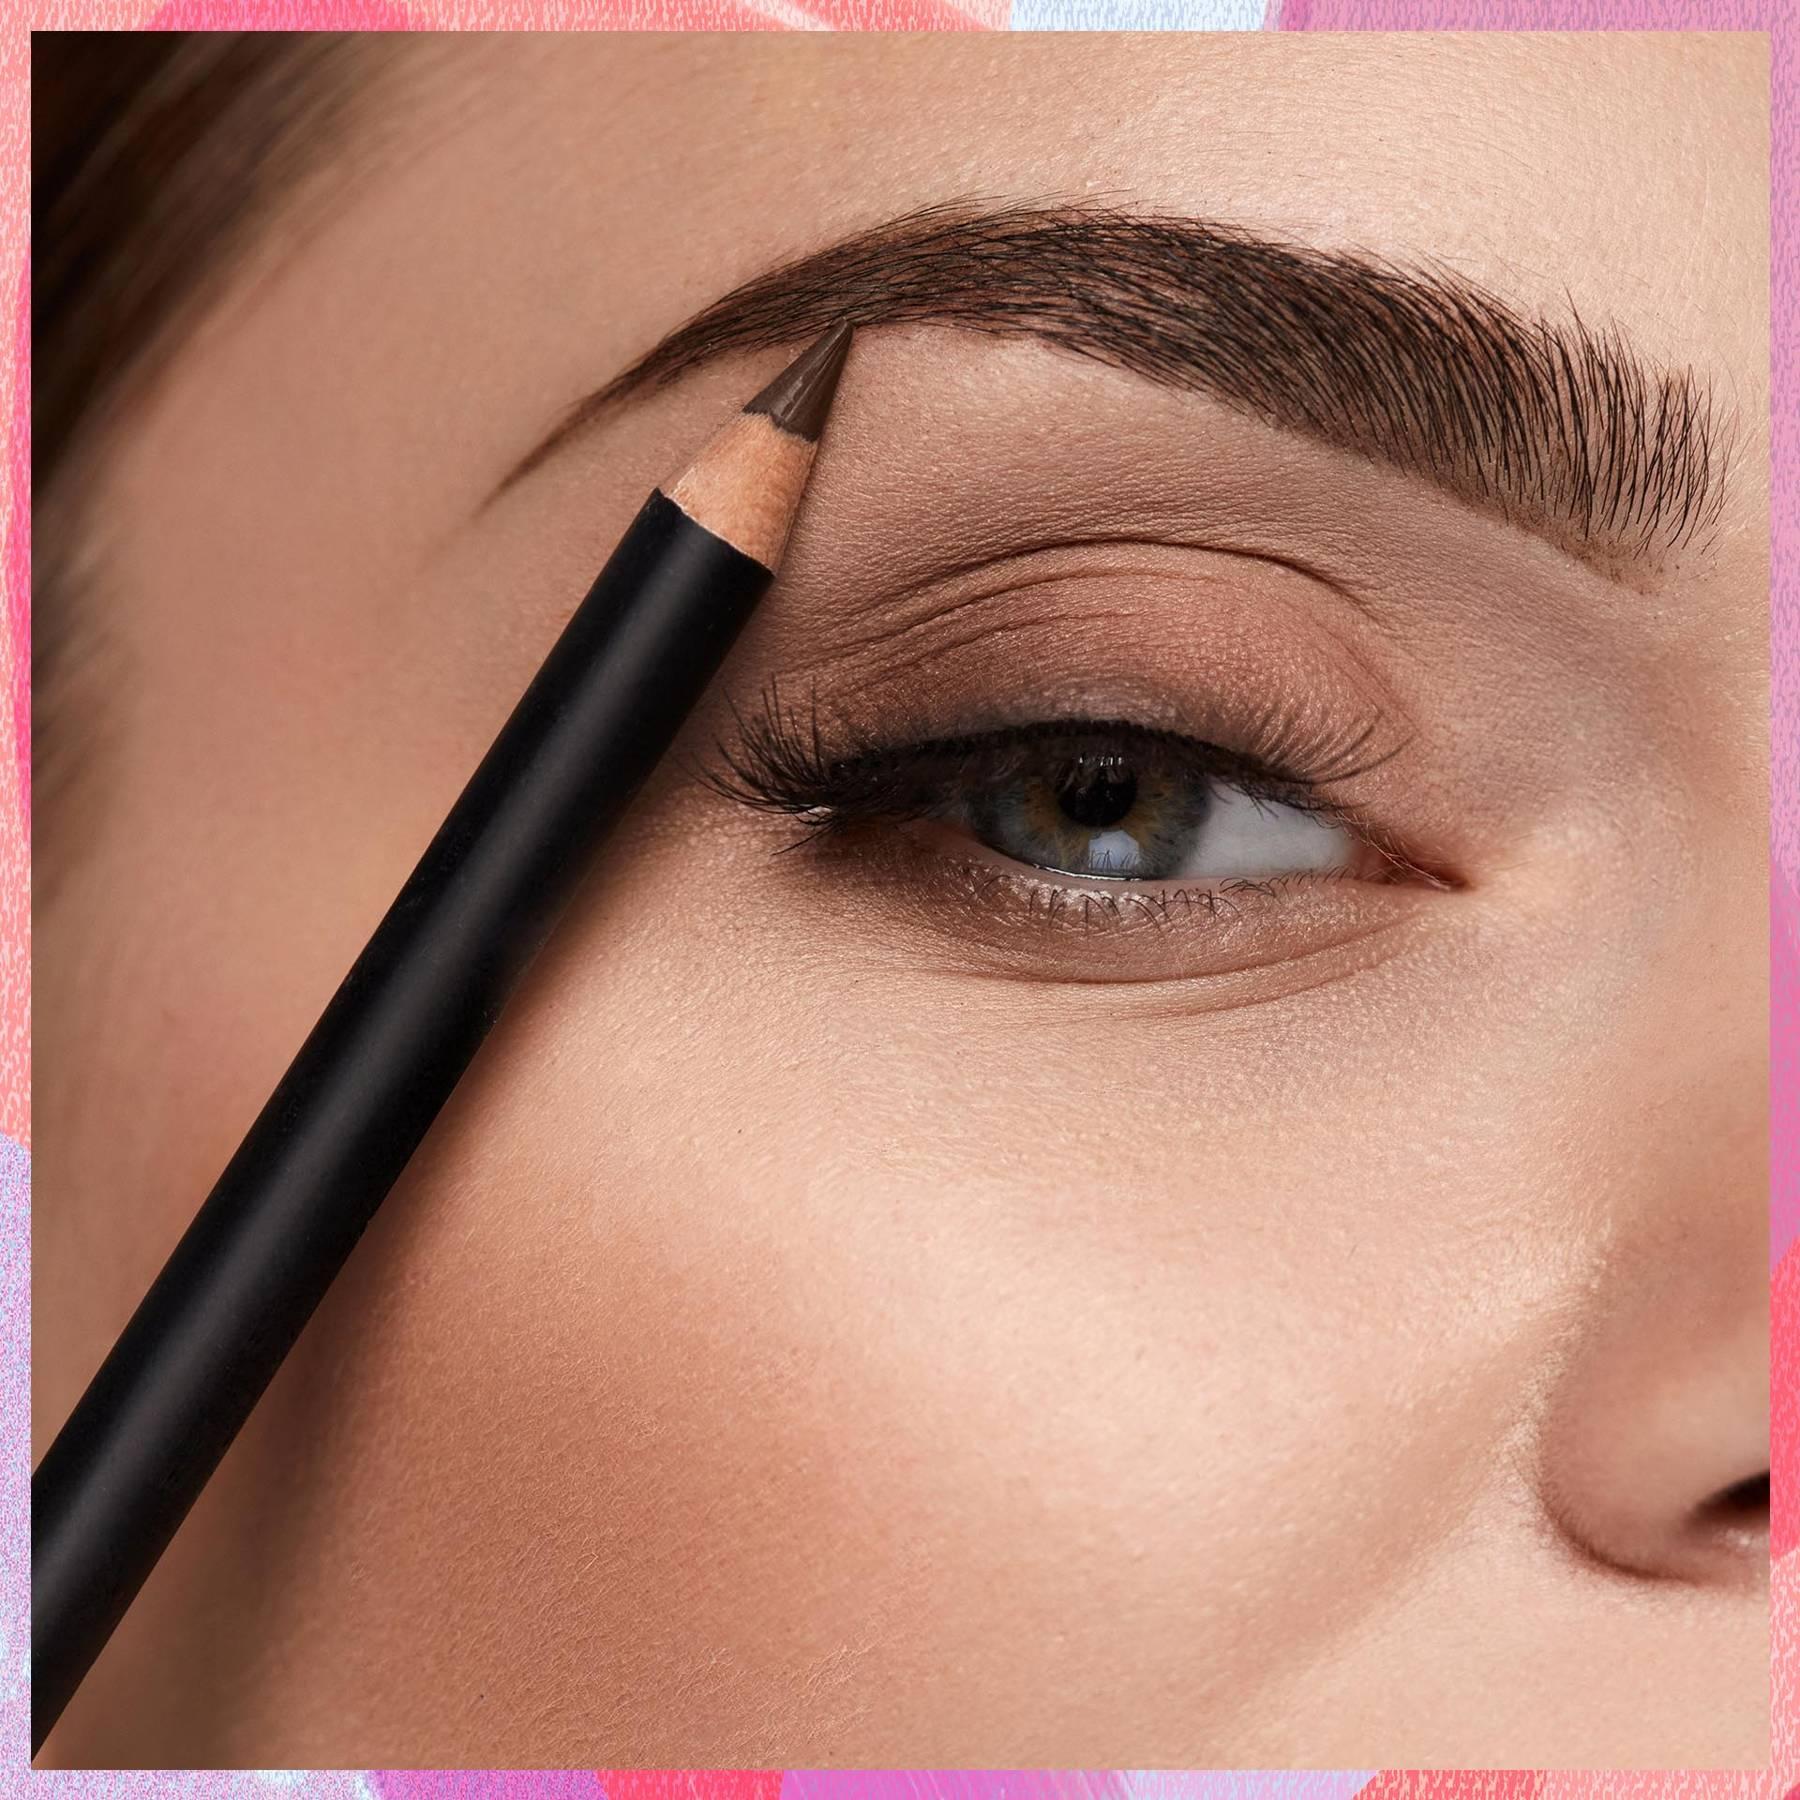 Microshading Eyebrow Trend Get The Look Glamour Uk